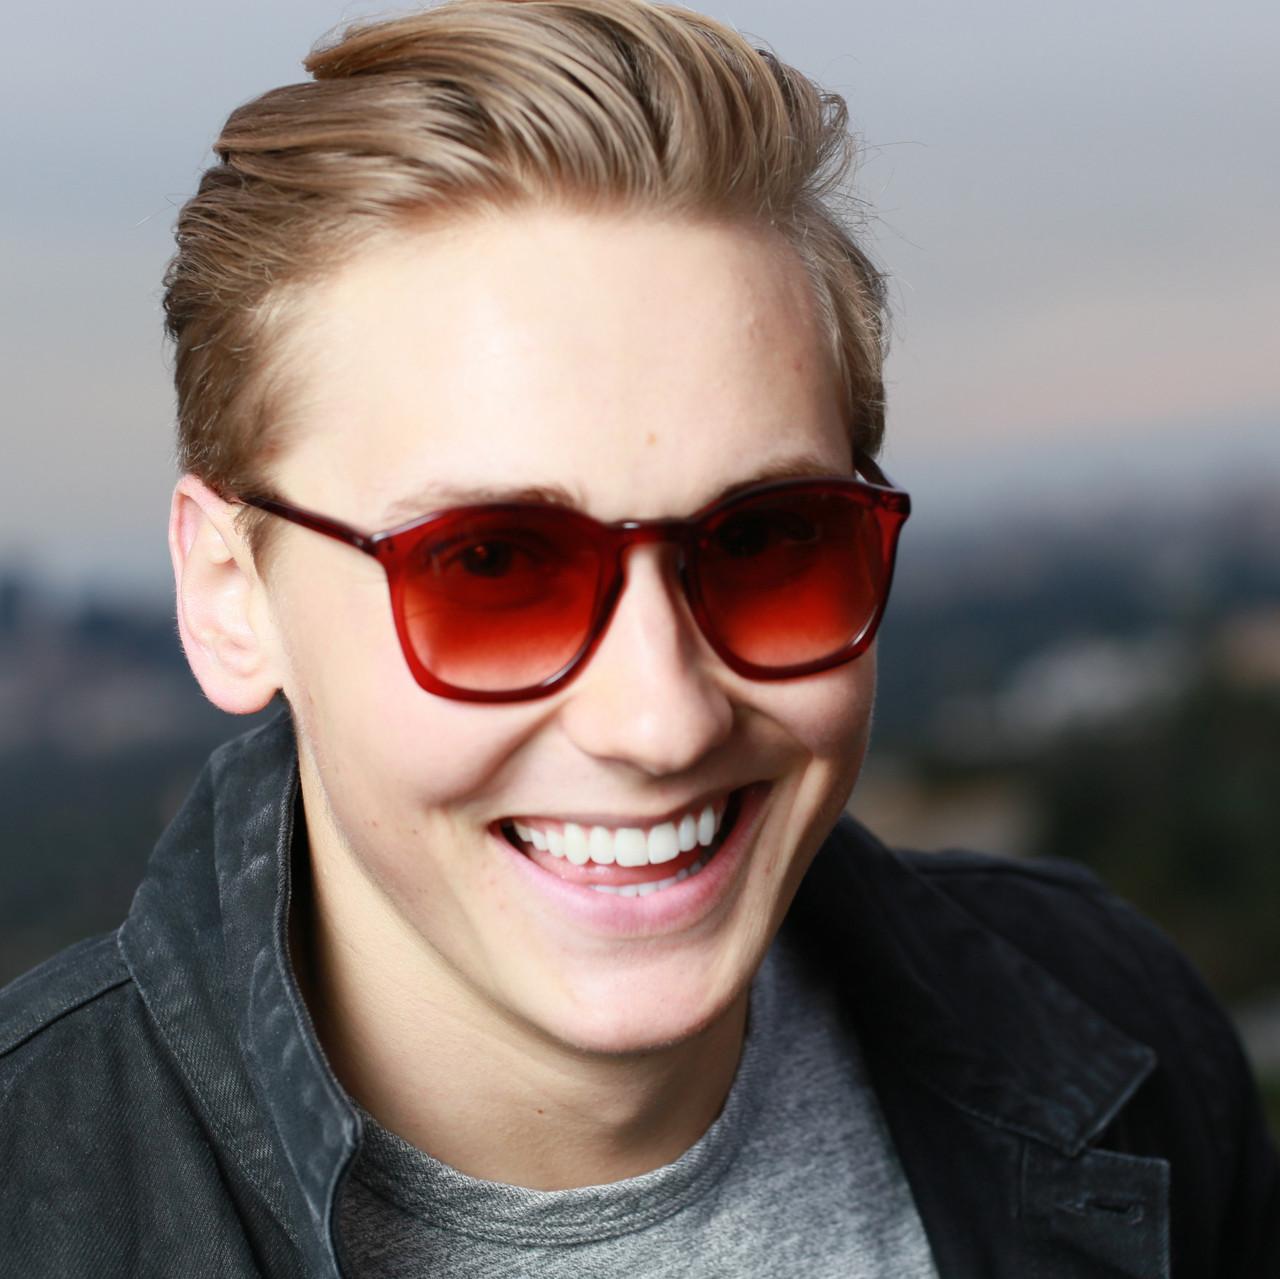 GEEK Eyewear GEEK ROUQ 4.0 Sunglass Marsala